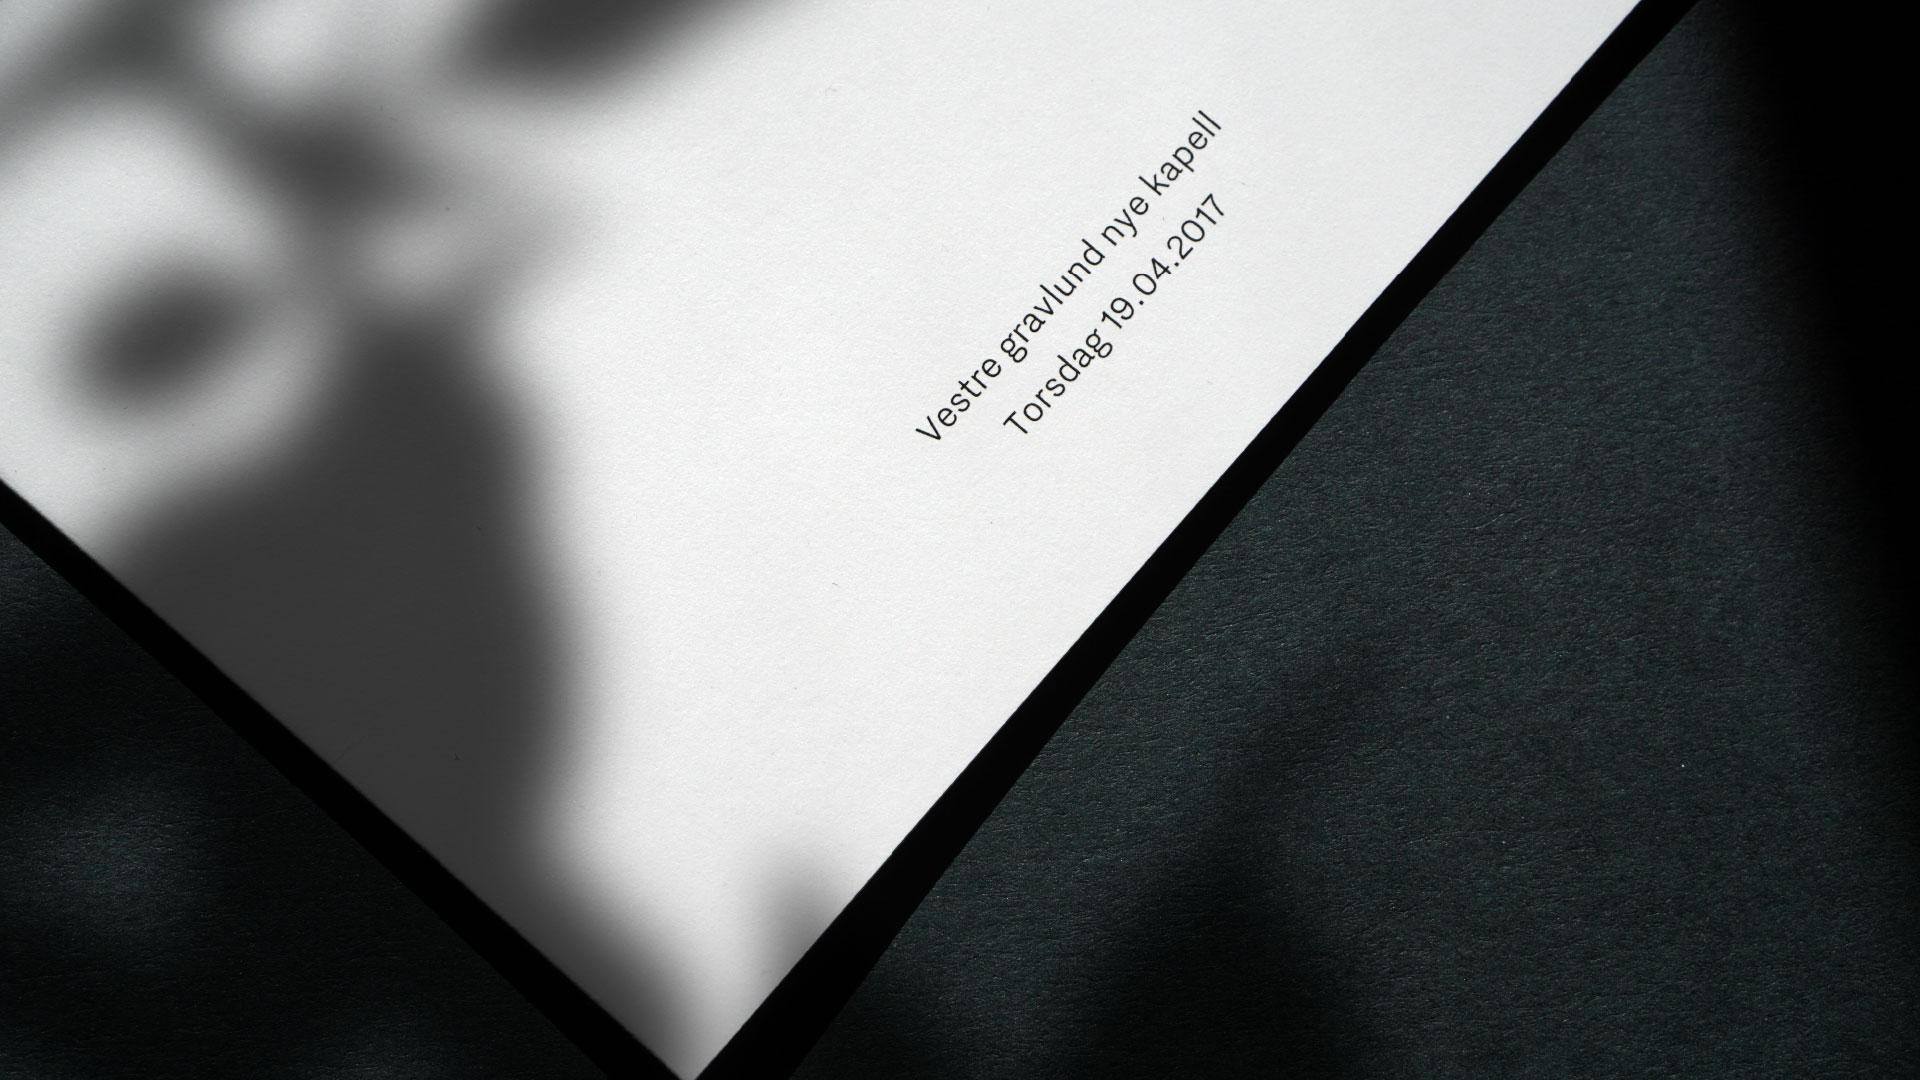 VERD_detail_horizontal